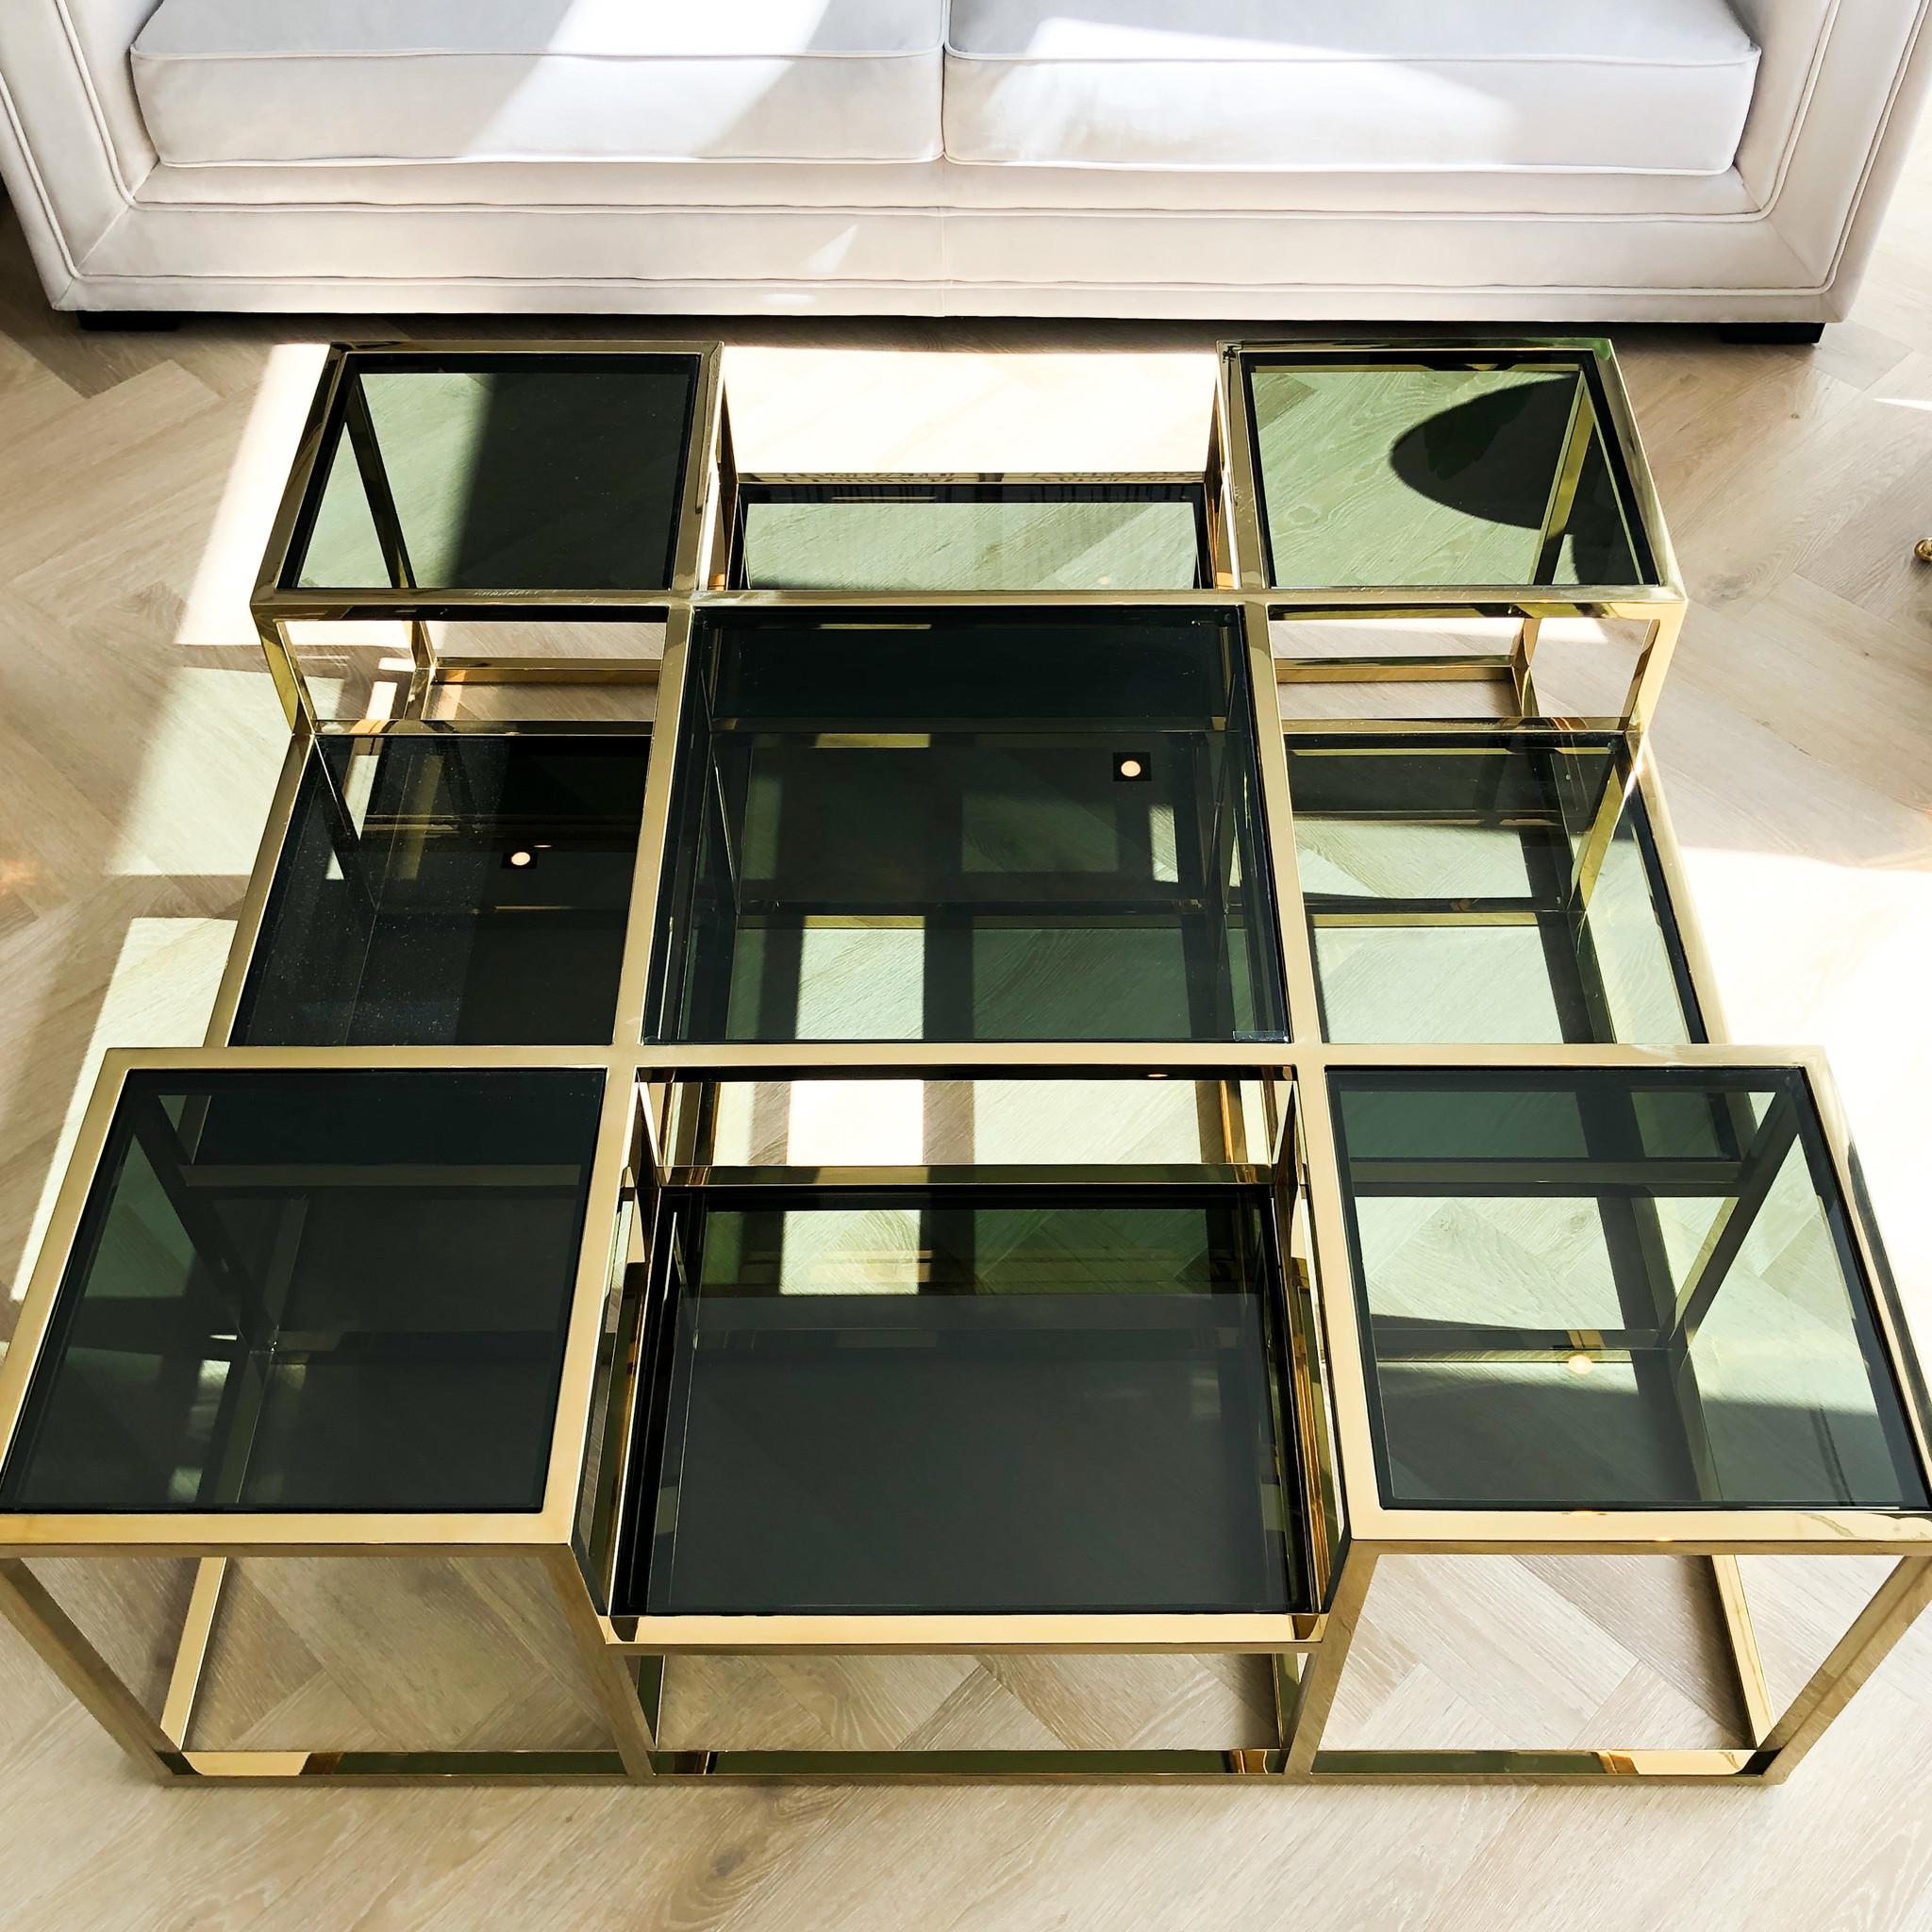 Design Coffee Table Astoria Gold-6